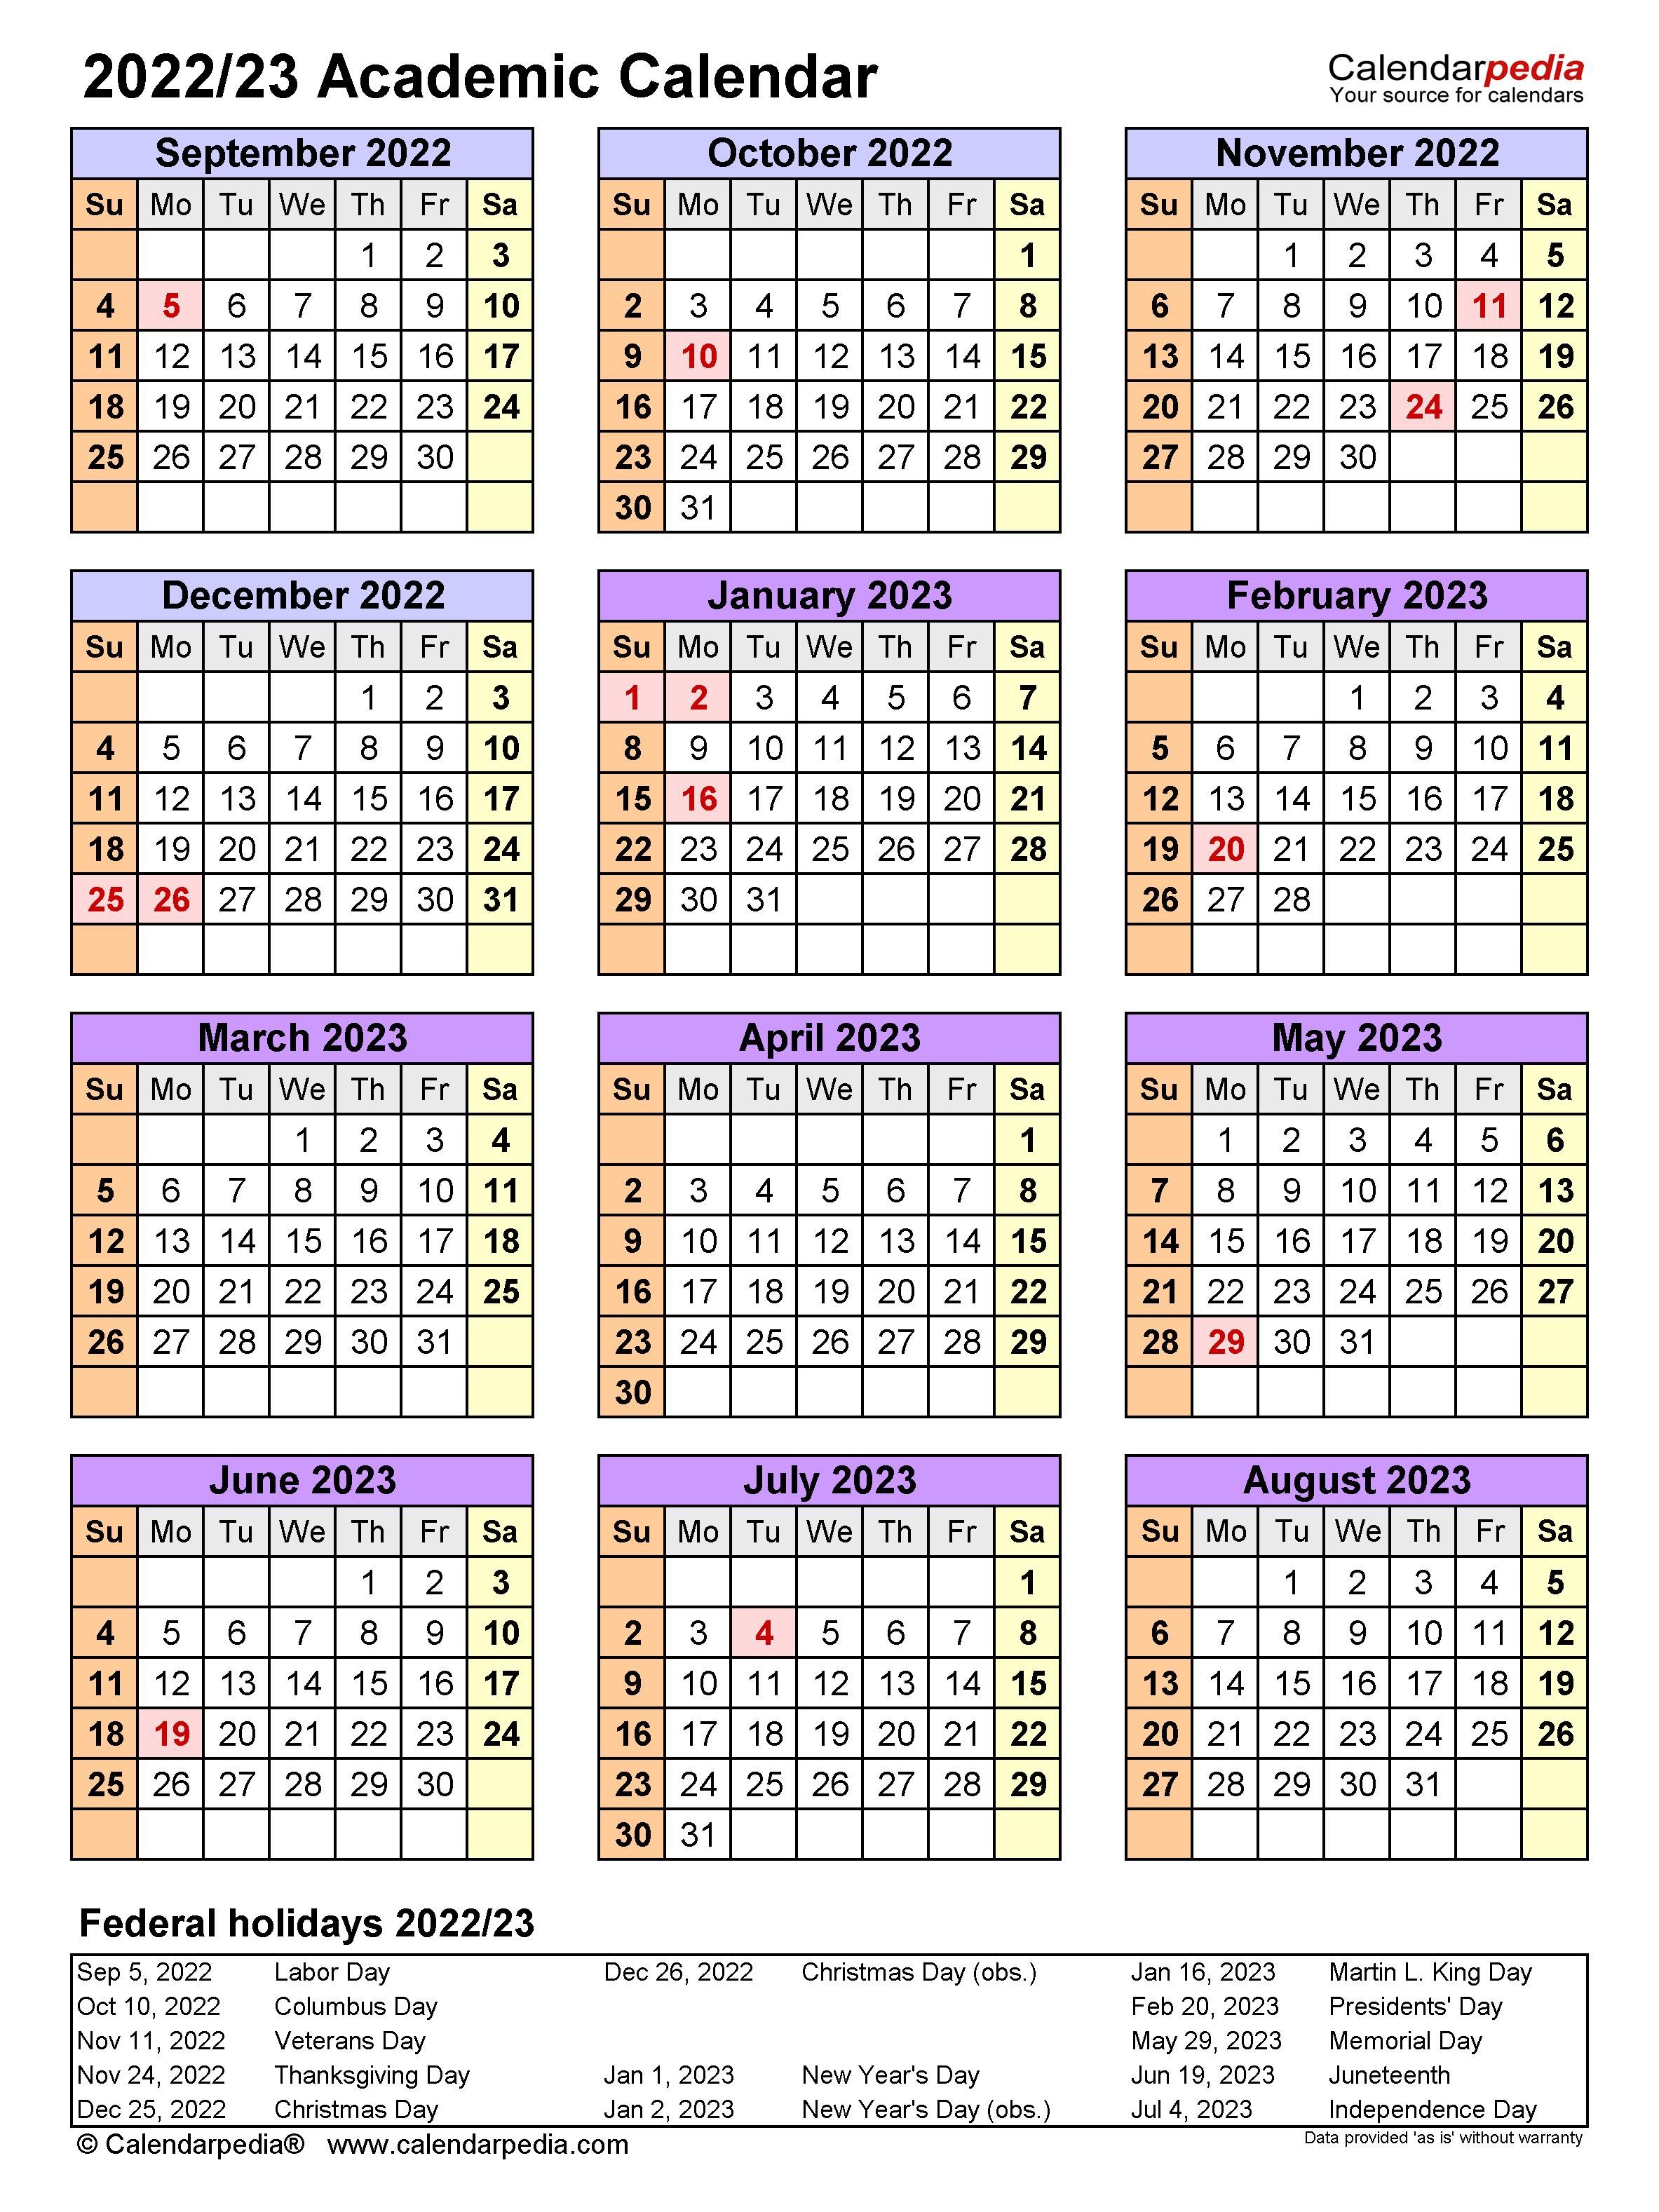 Cusd Calendar 2022 23.Academic Calendars 2022 2023 Free Printable Word Templates